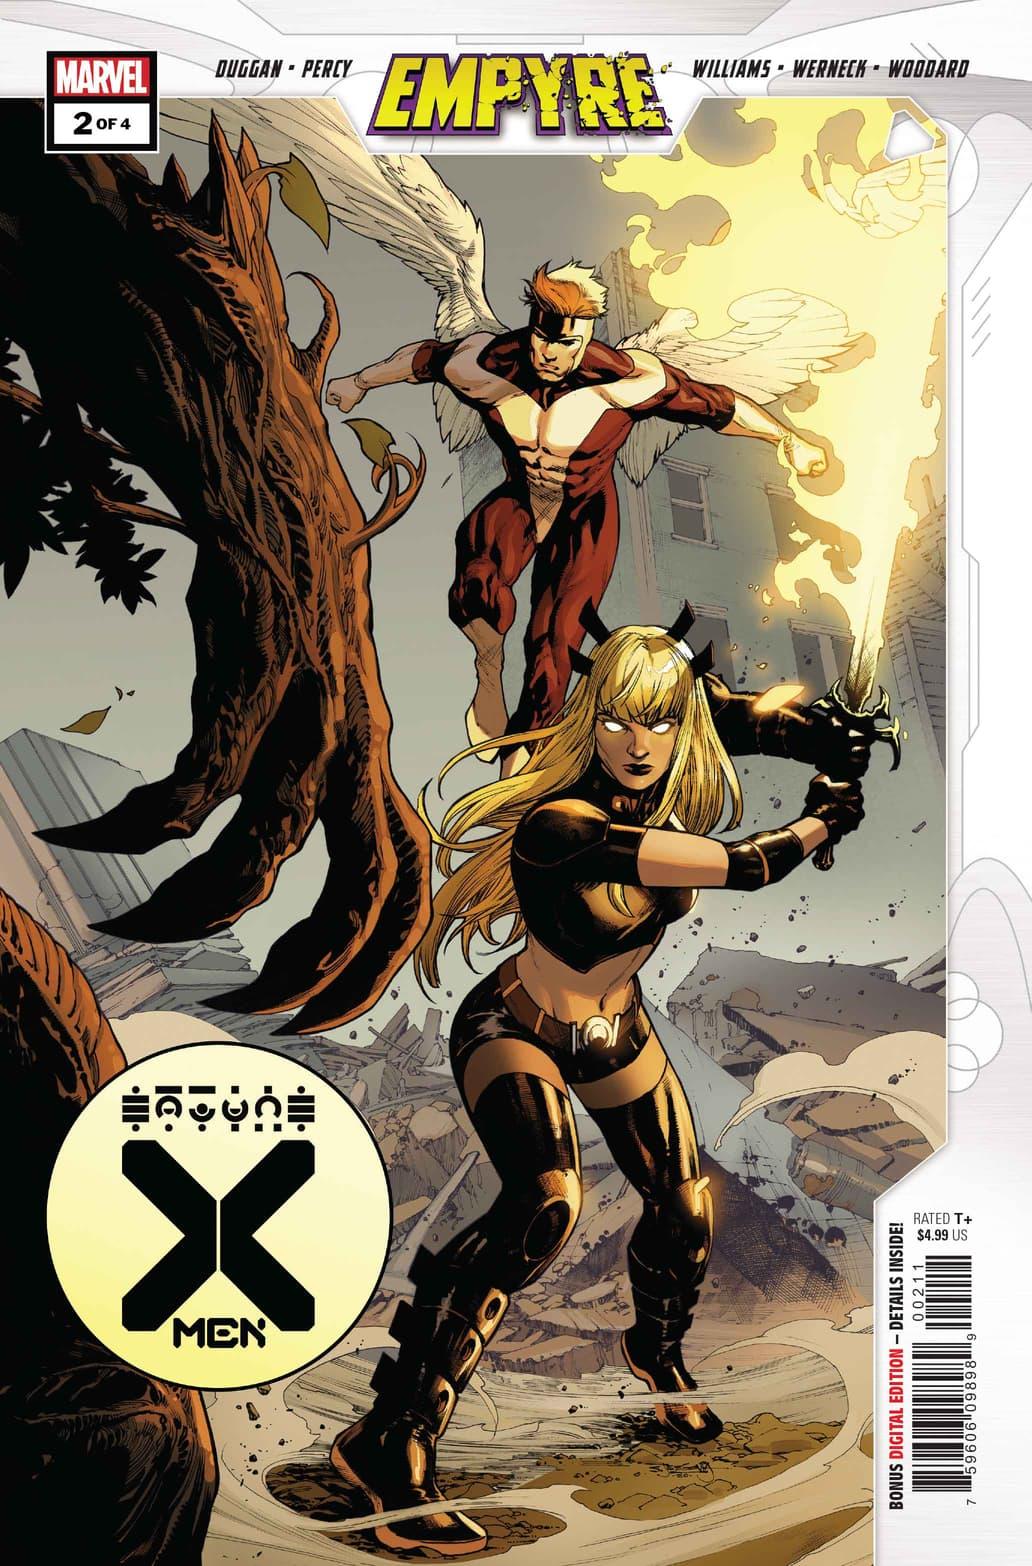 Empyre X-Men #2 cover